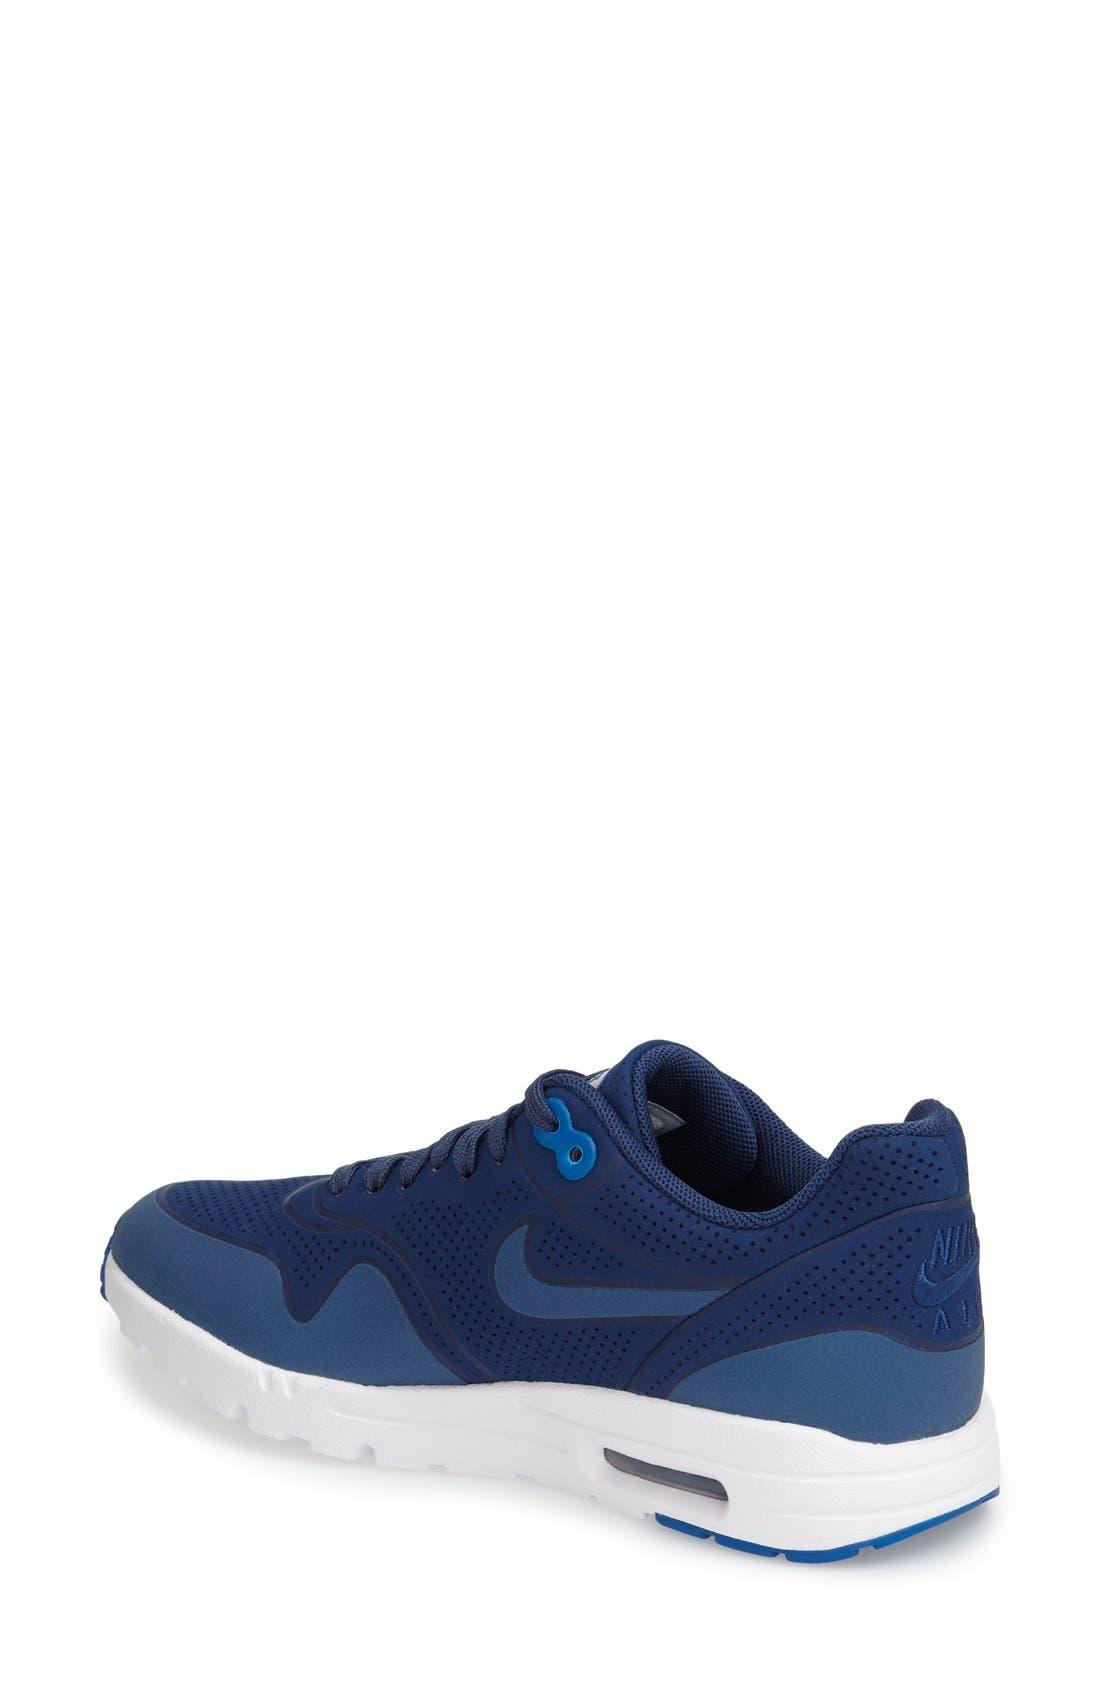 ,                             'Air Max 1 - Ultra Moire' Sneaker,                             Alternate thumbnail 86, color,                             403